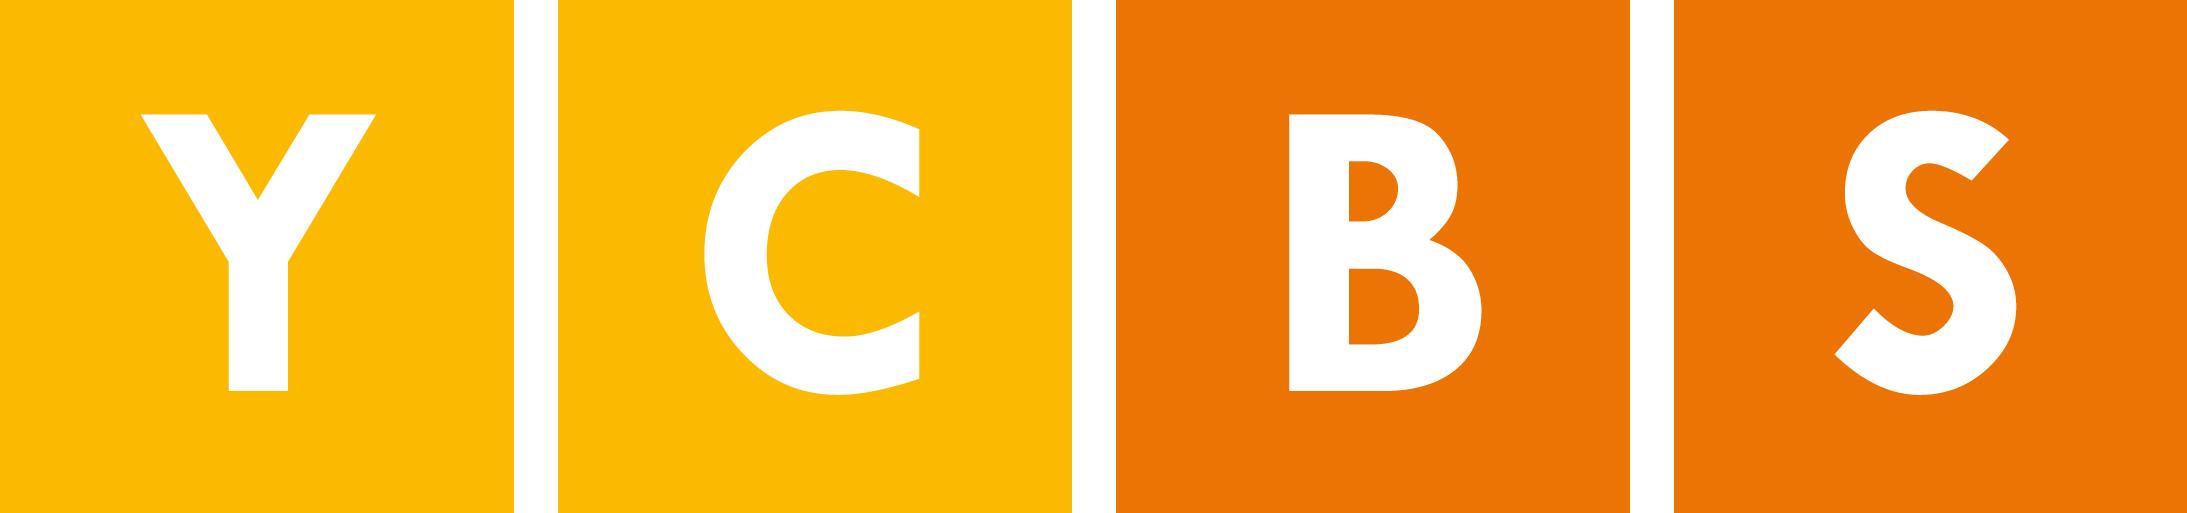 logo_ycbs_ymck_2